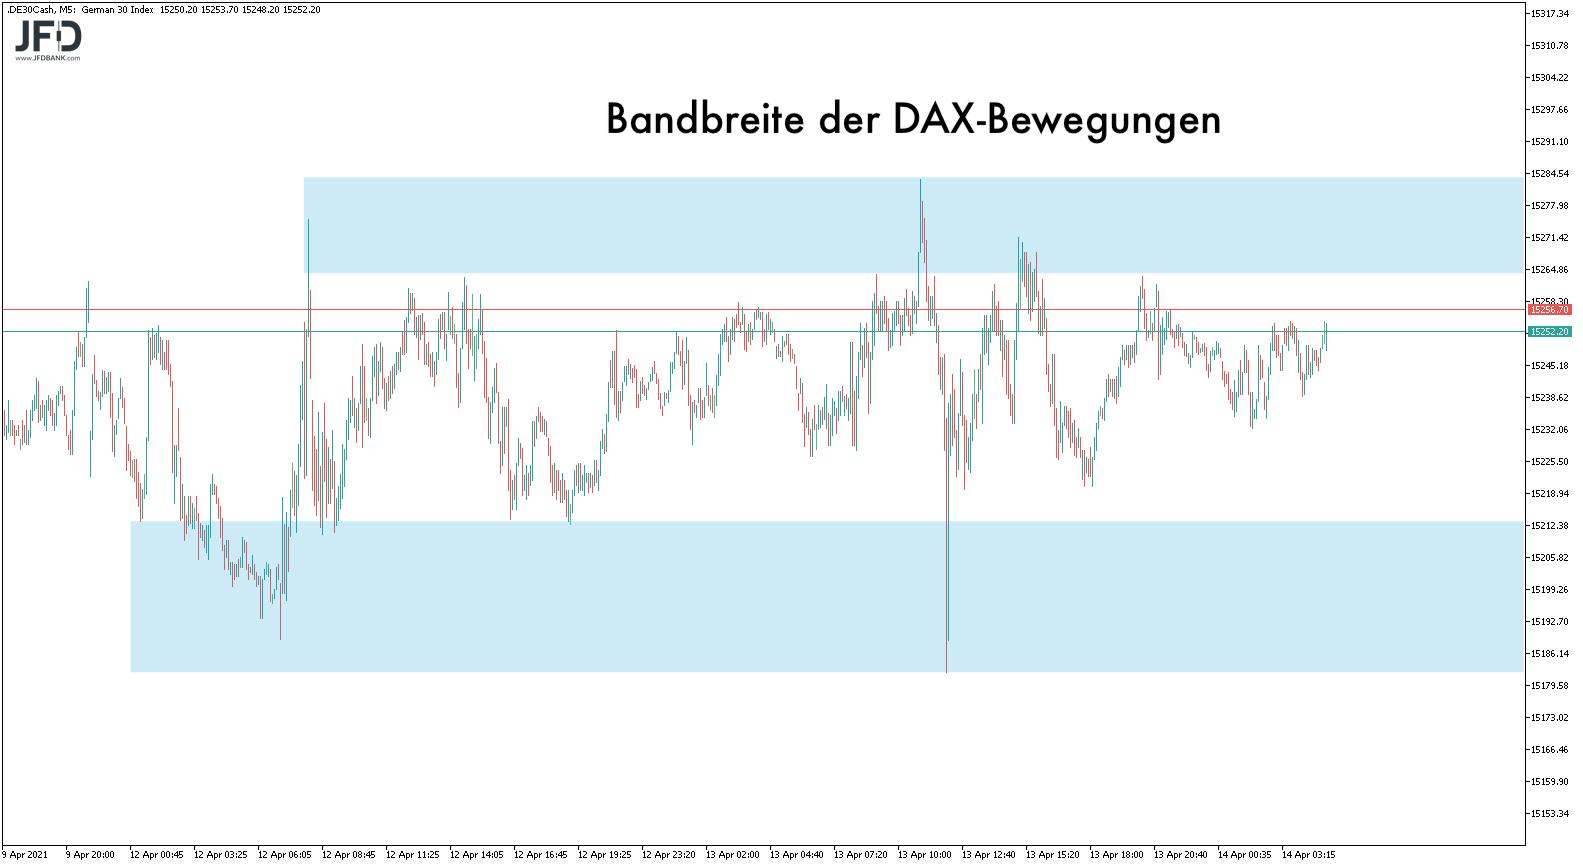 Gefangen-in-der-DAX-Range-Kommentar-JFD-Bank-GodmodeTrader.de-3